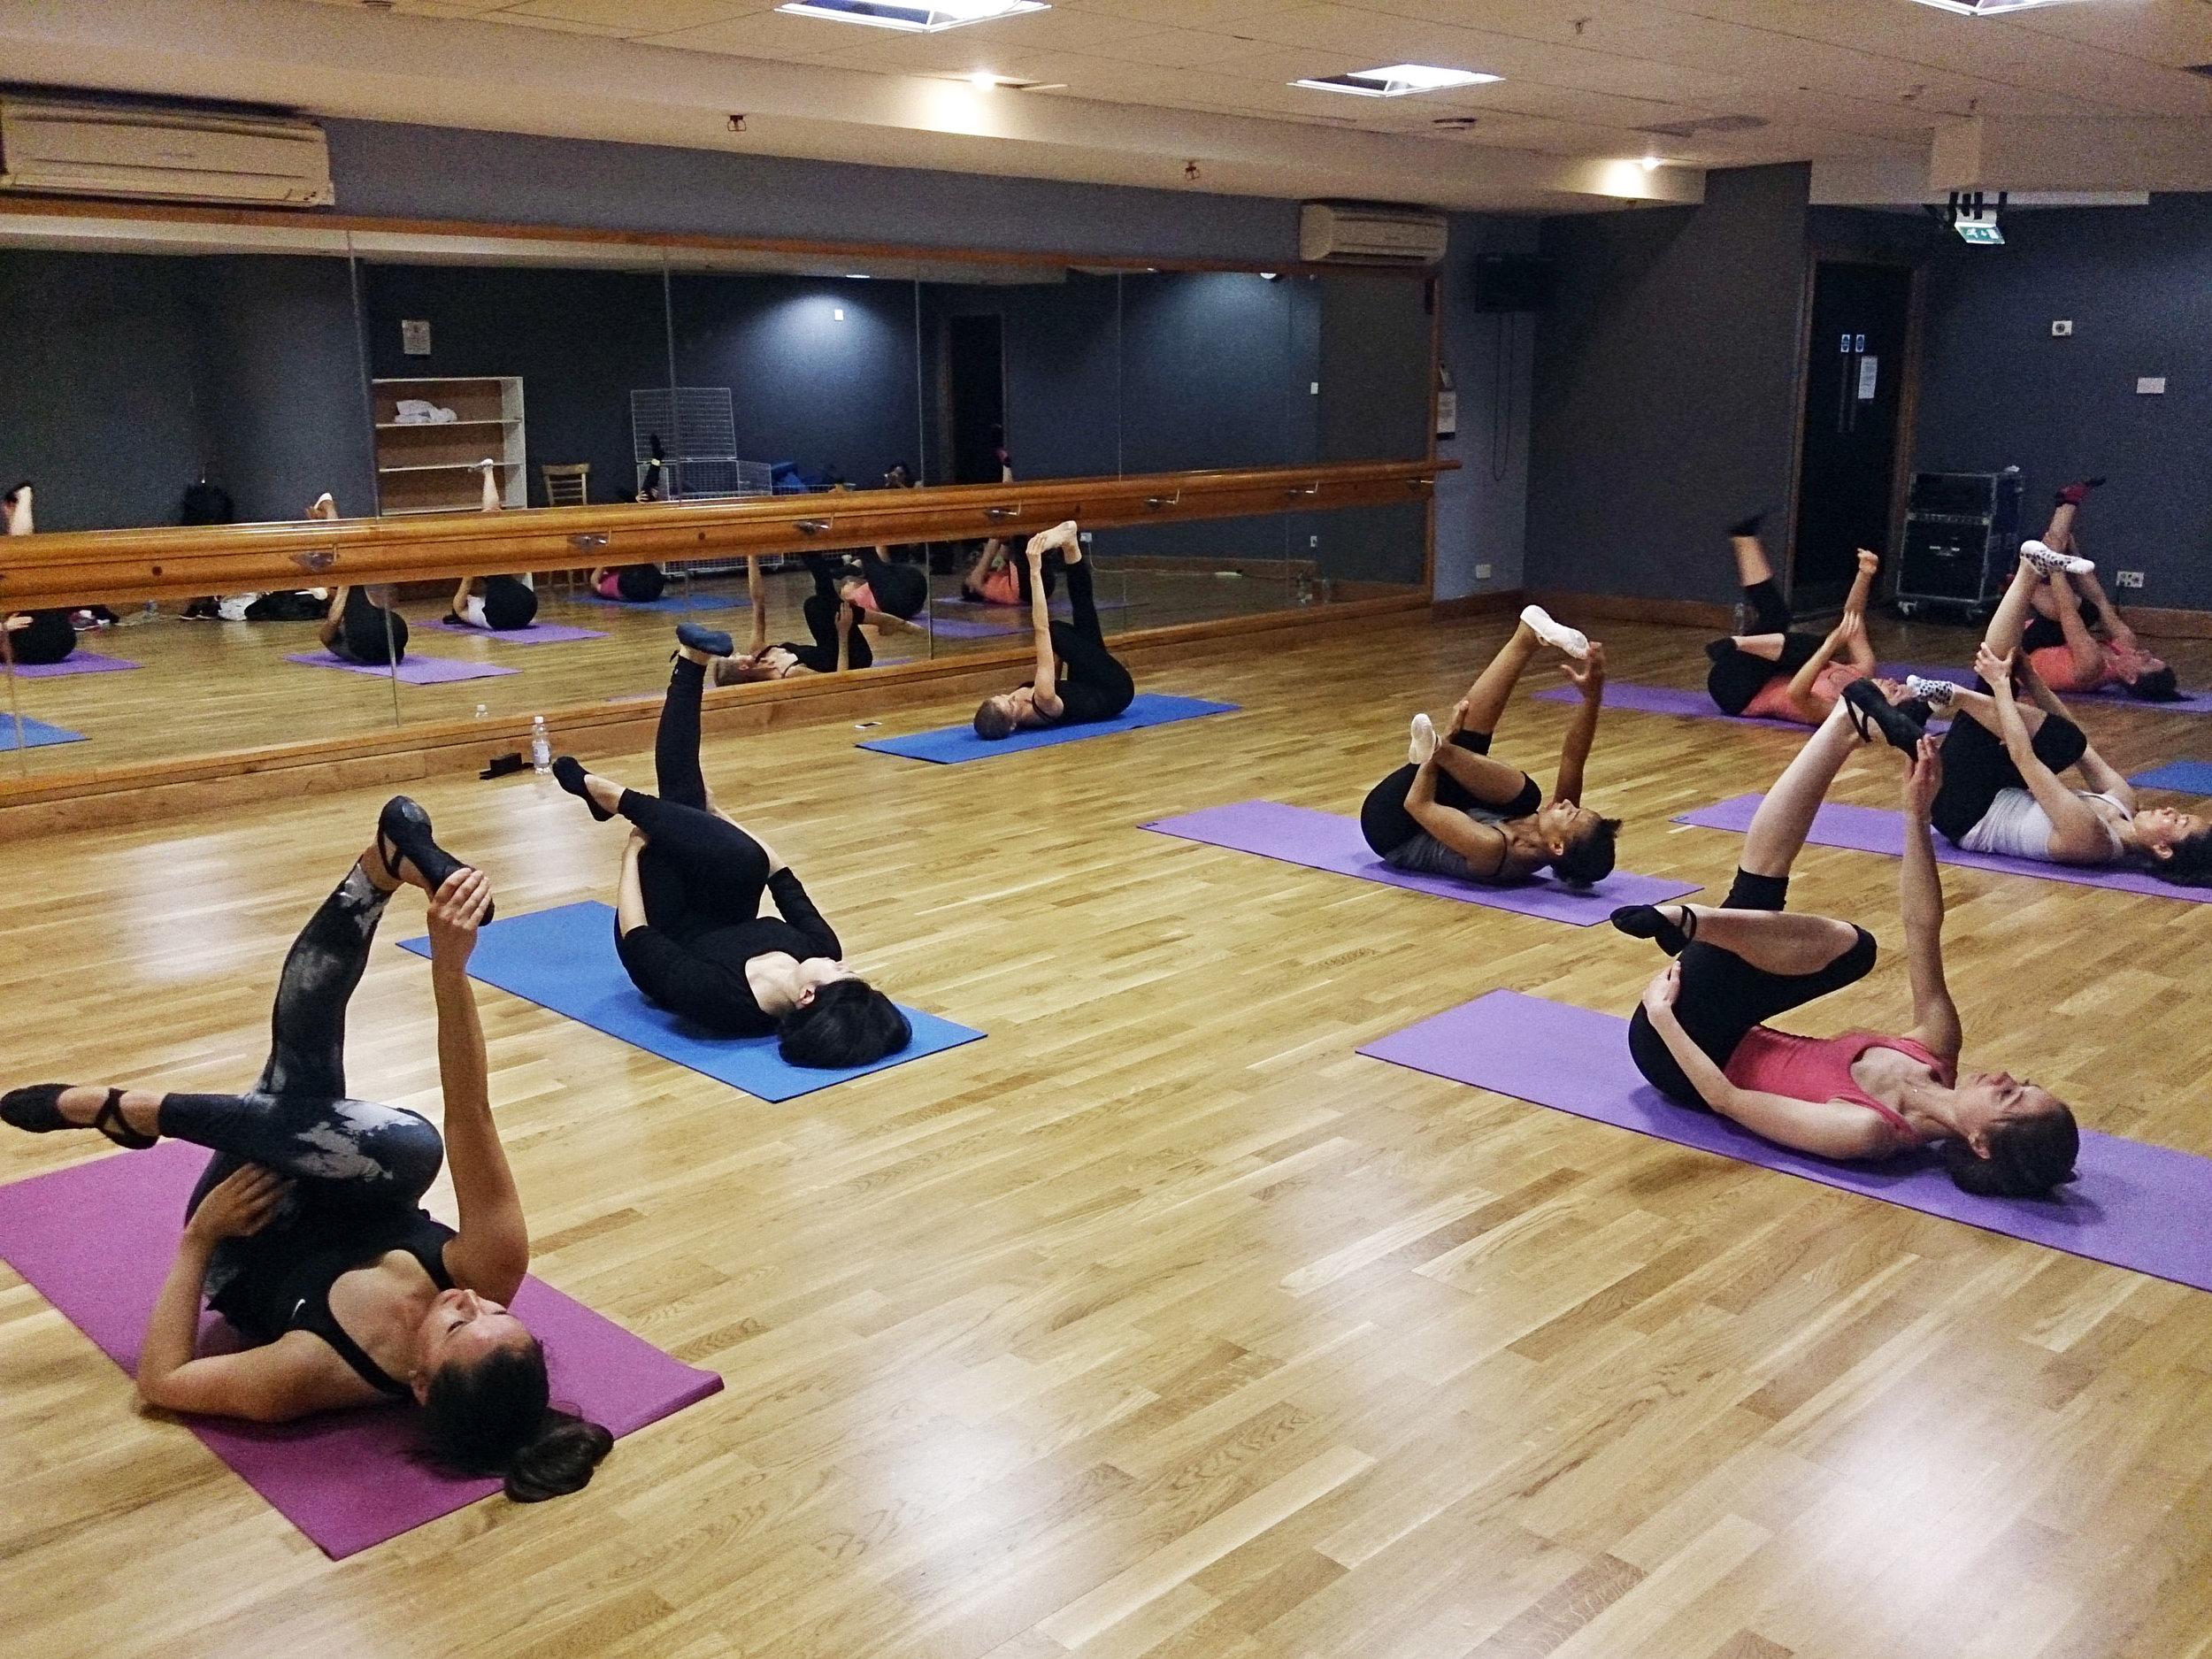 Copy of ballet body sculpture flexibility classes